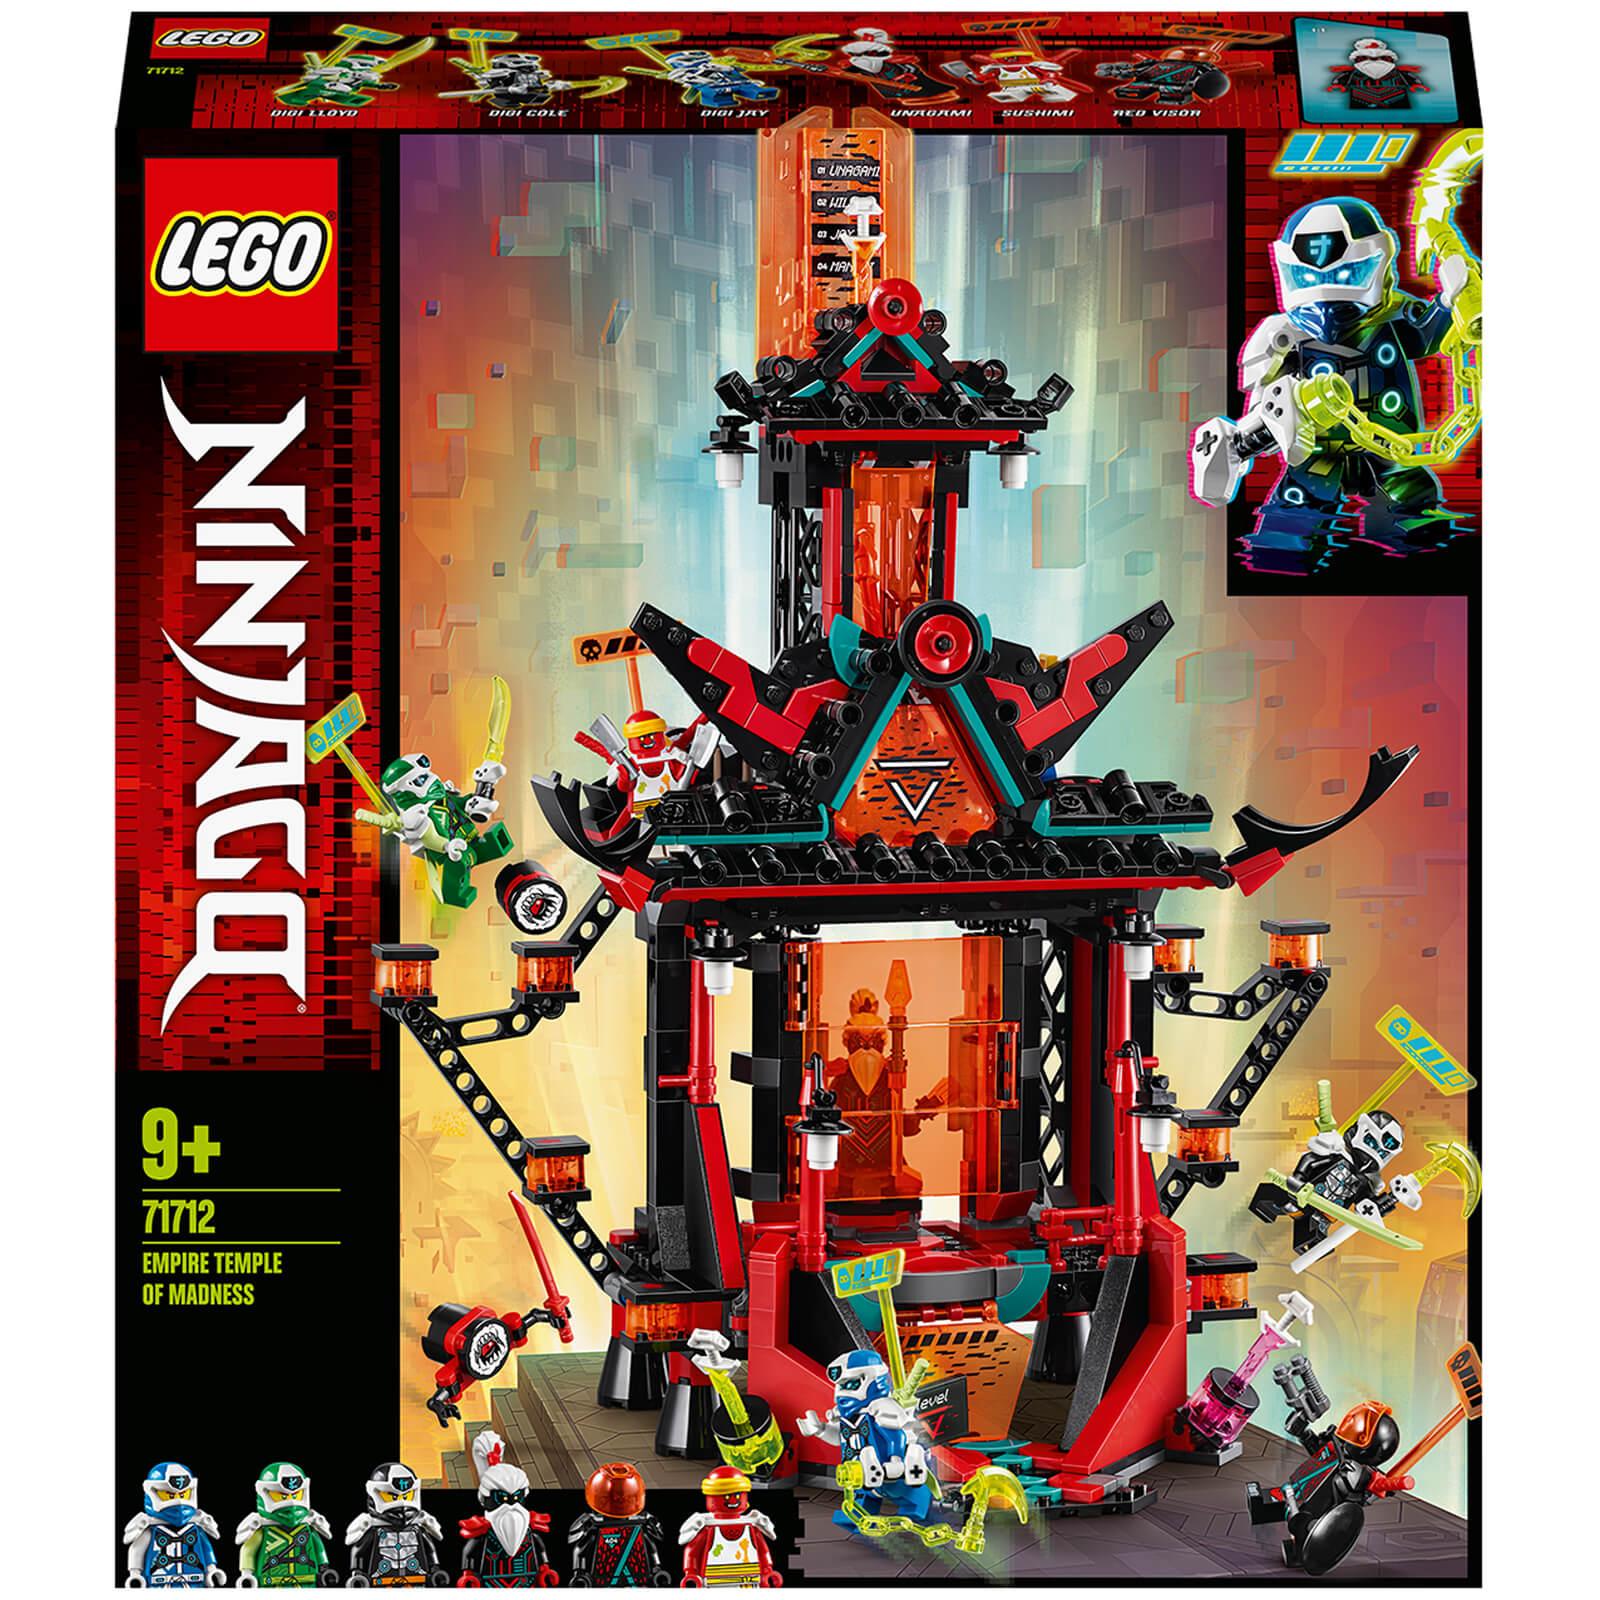 Image of 71712 LEGO® NINJAGO Temple of nonsense